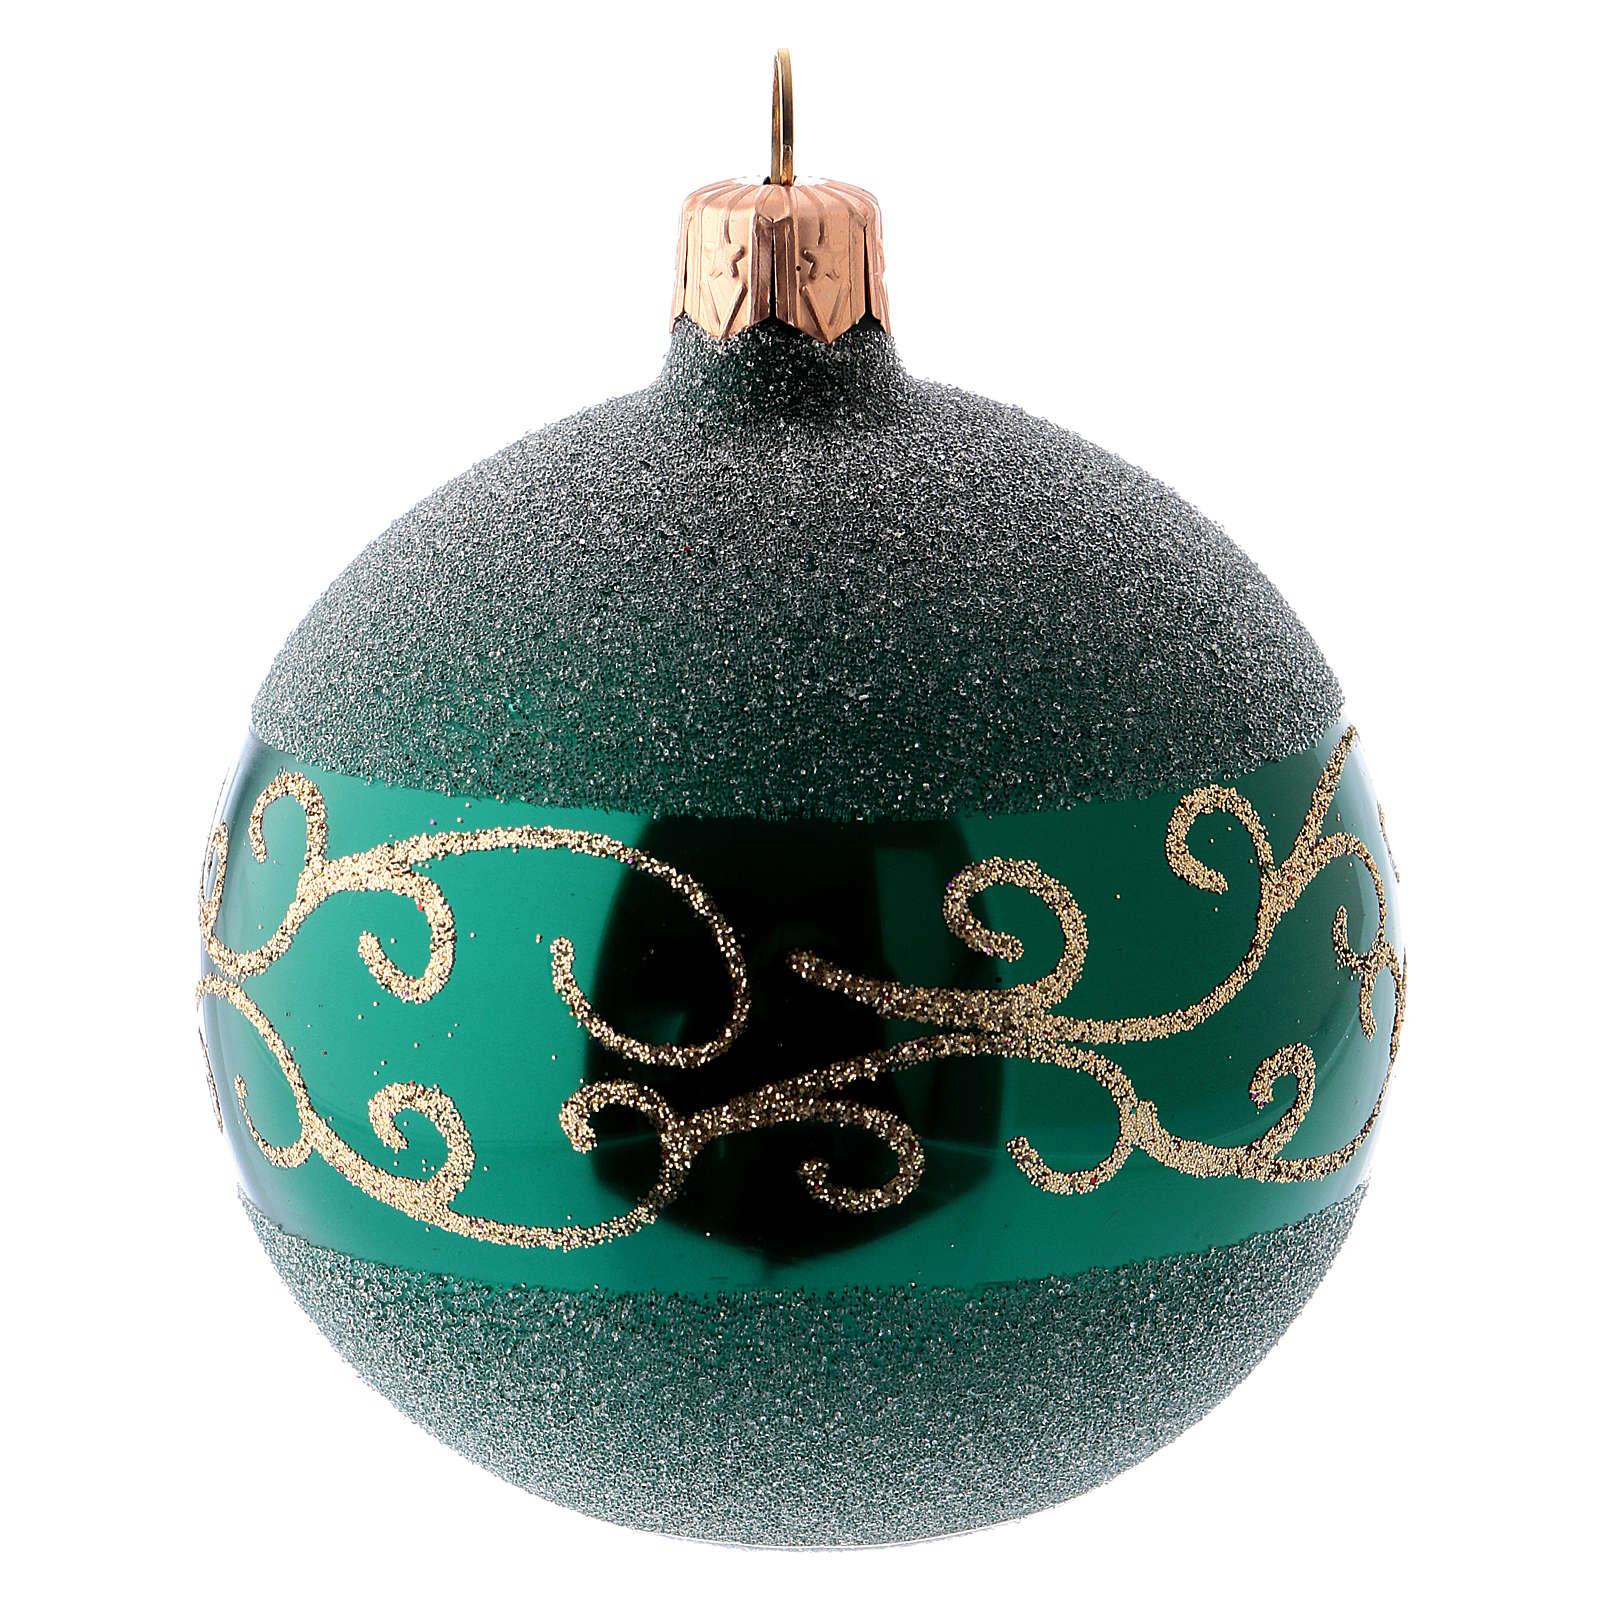 Bolitas árbol Navidad 6 piezas vidrio soplado verde motivos dorados 80 mm 4